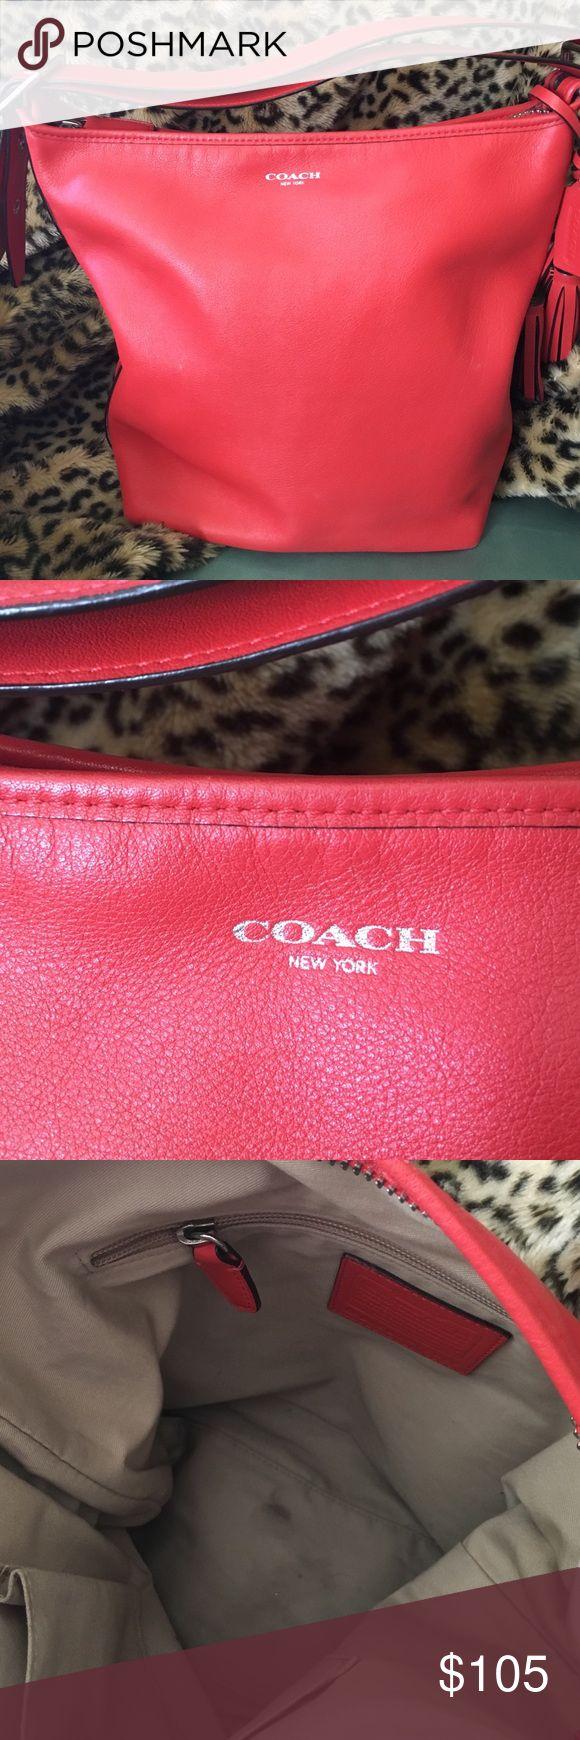 Coach Legacy shoulder bag Coach Legacy shoulder bag in vermillion. Adjustable shoulder strap. Small lotion stain in bottom of inside. Includes dust cover. Coach Bags Shoulder Bags